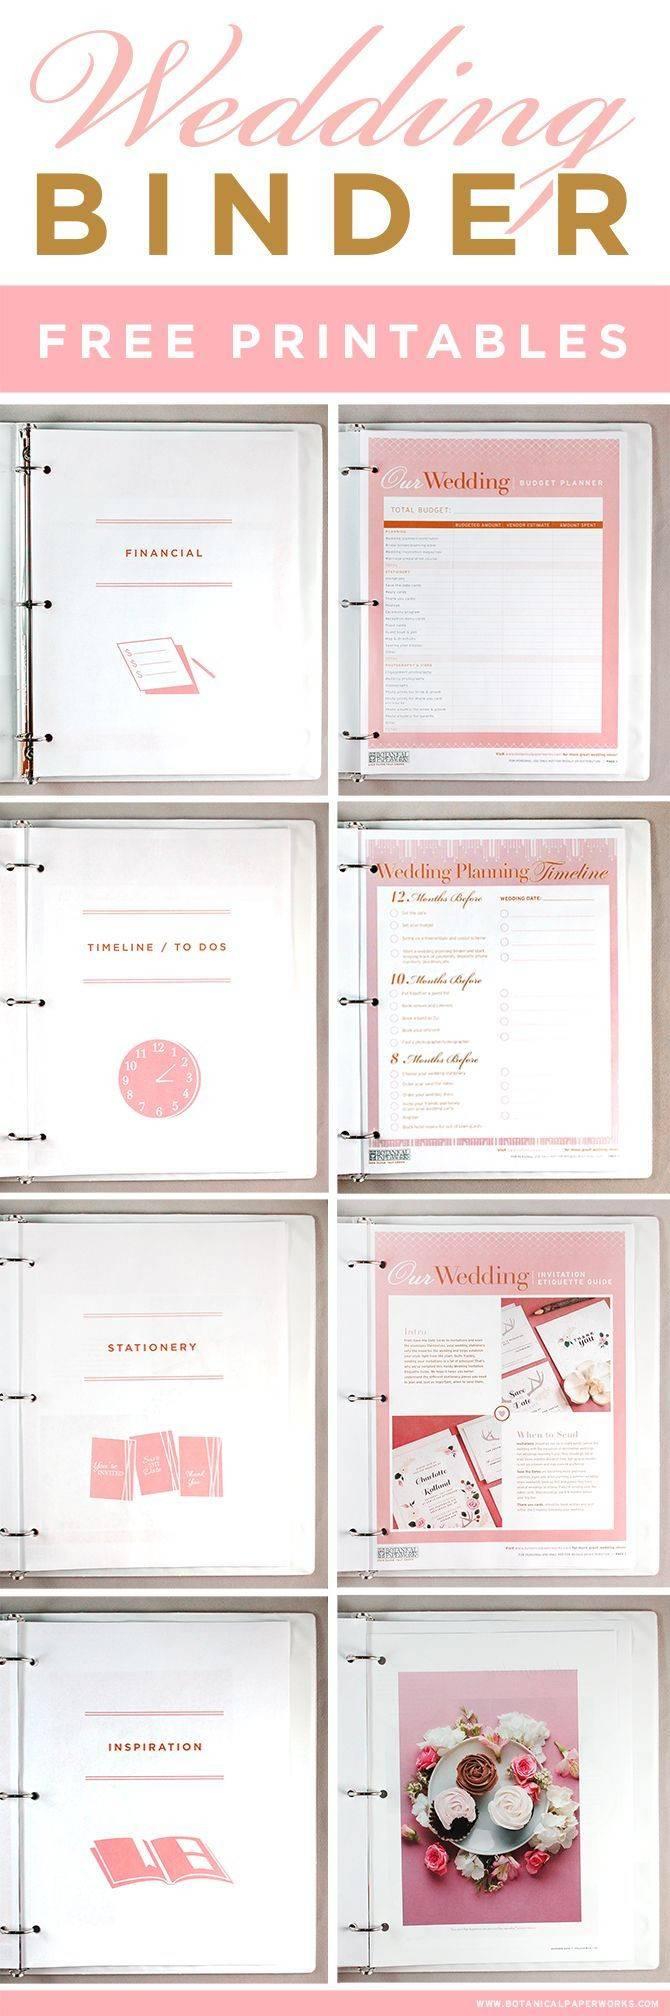 Wedding Planner Binder Cover Template